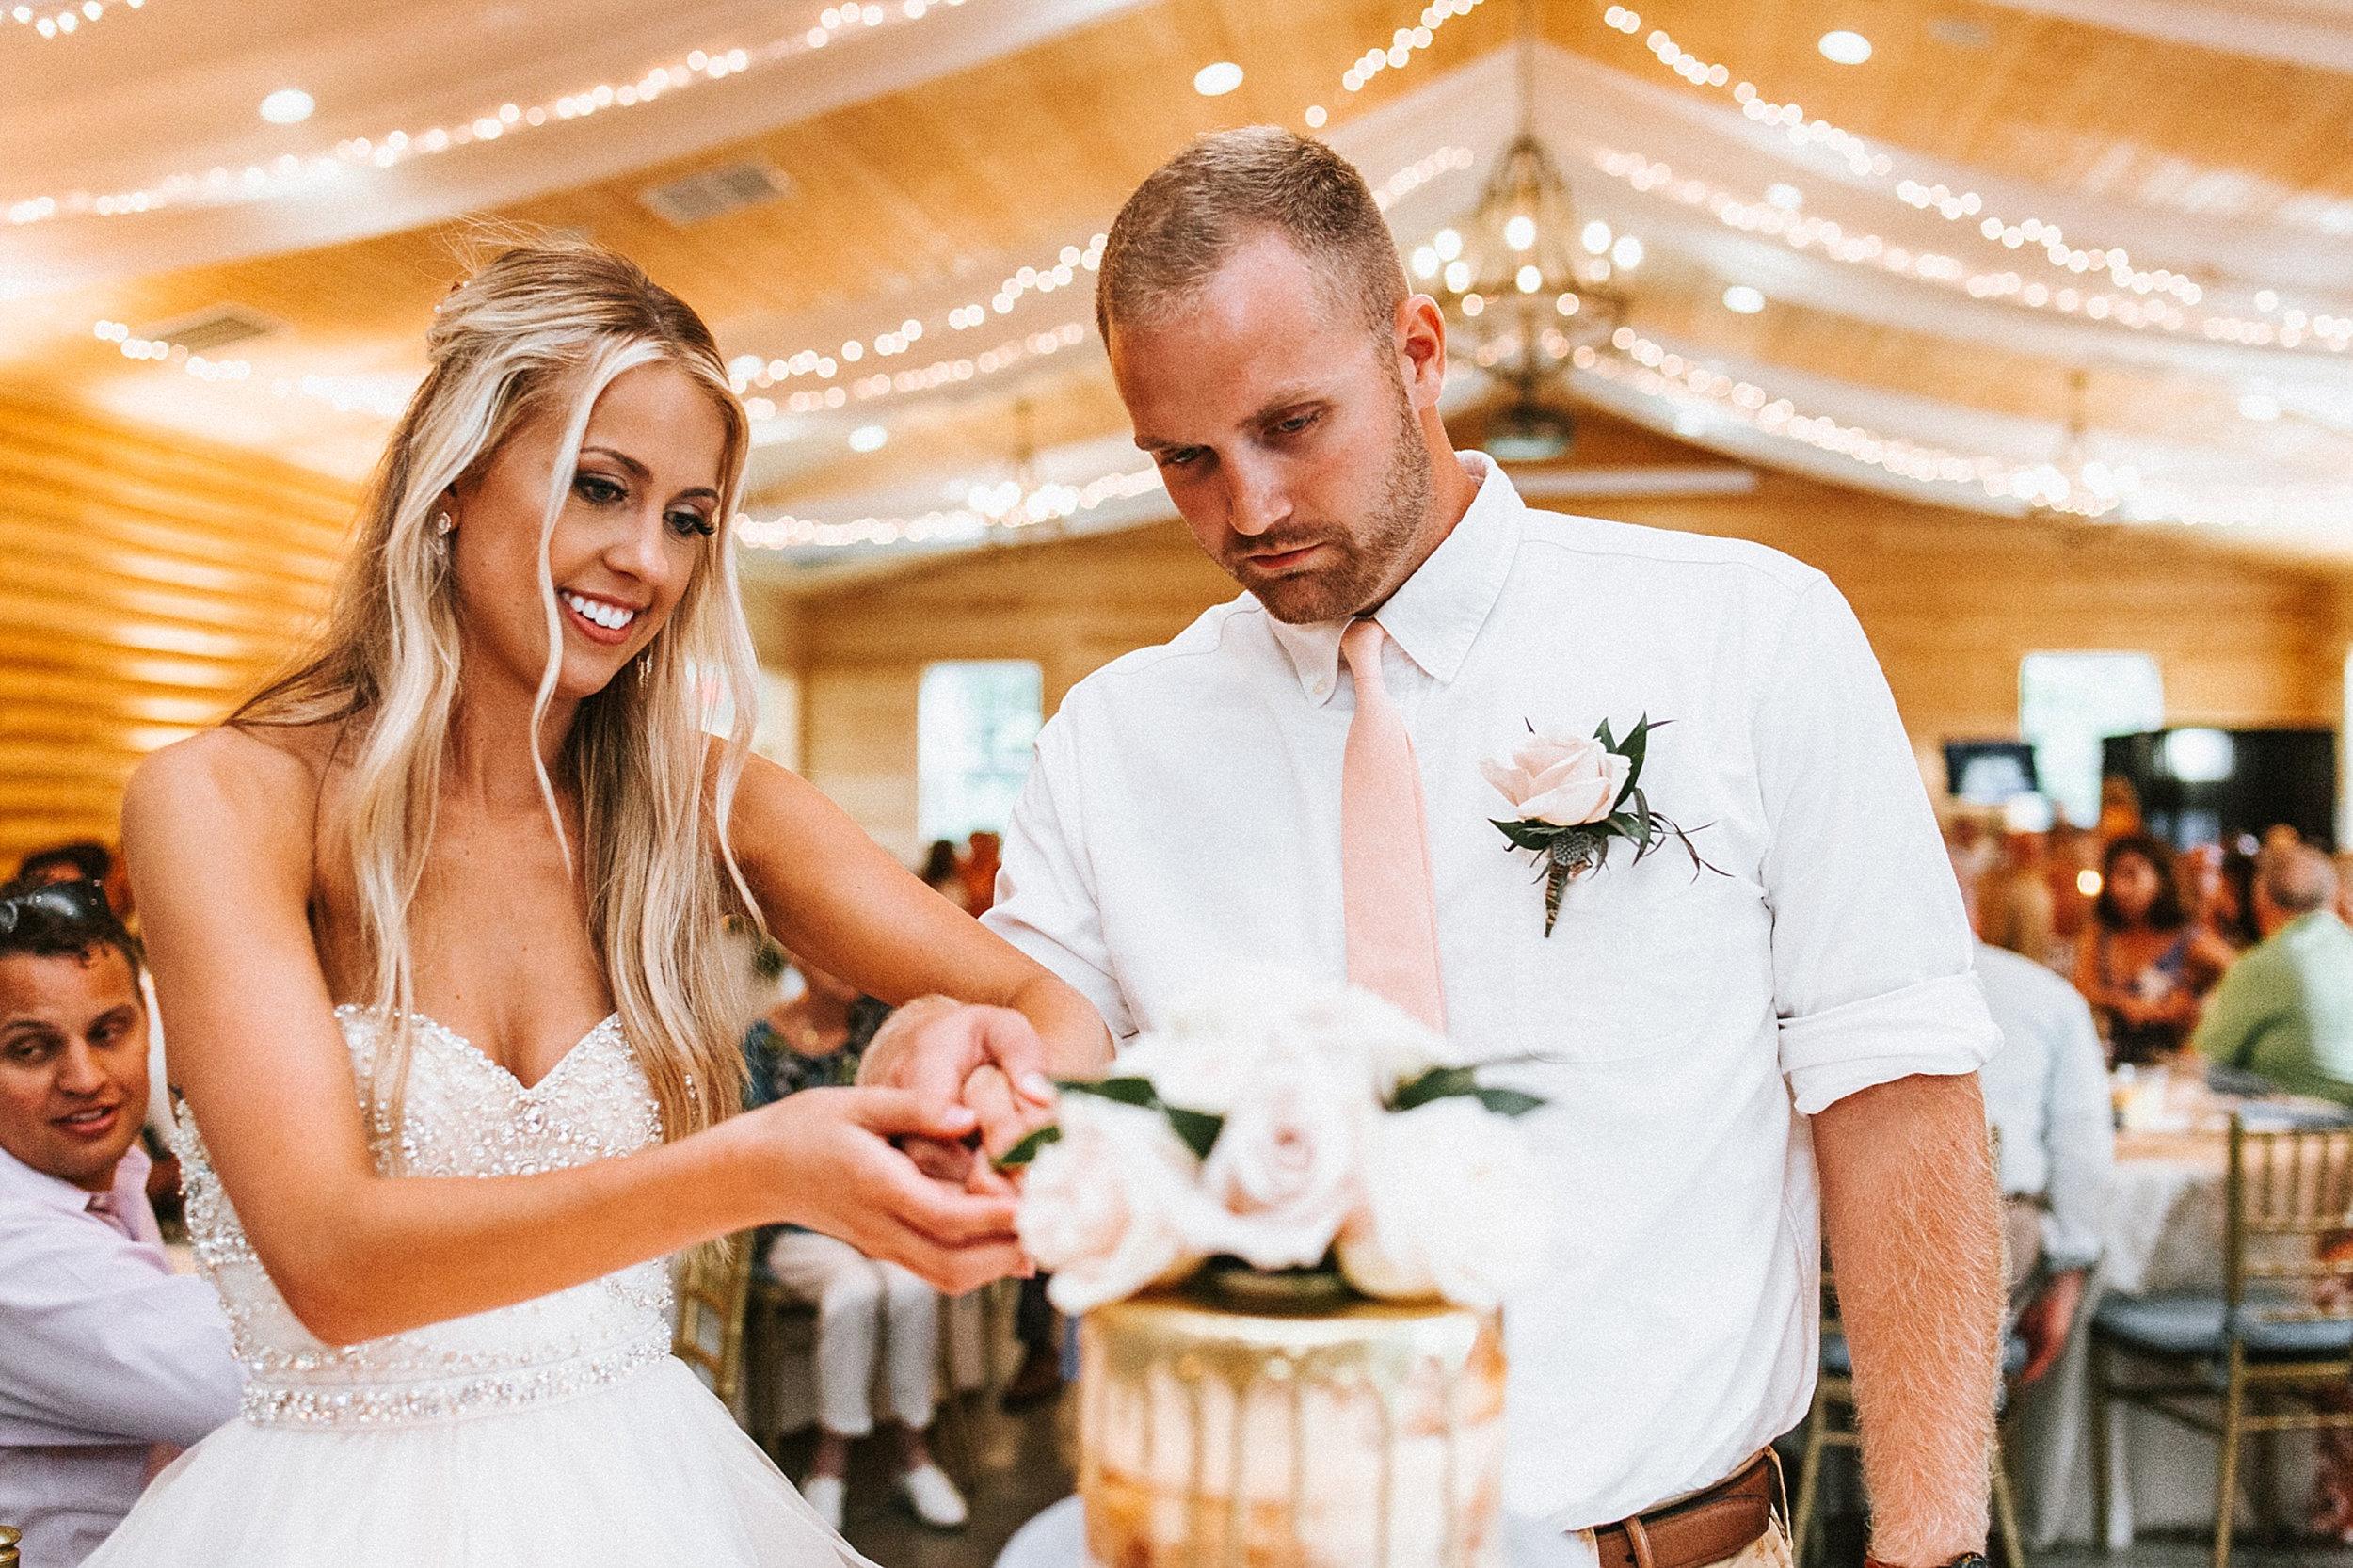 Brooke Townsend Photography - Cincinnati Wedding Photographer (139 of 153).jpg